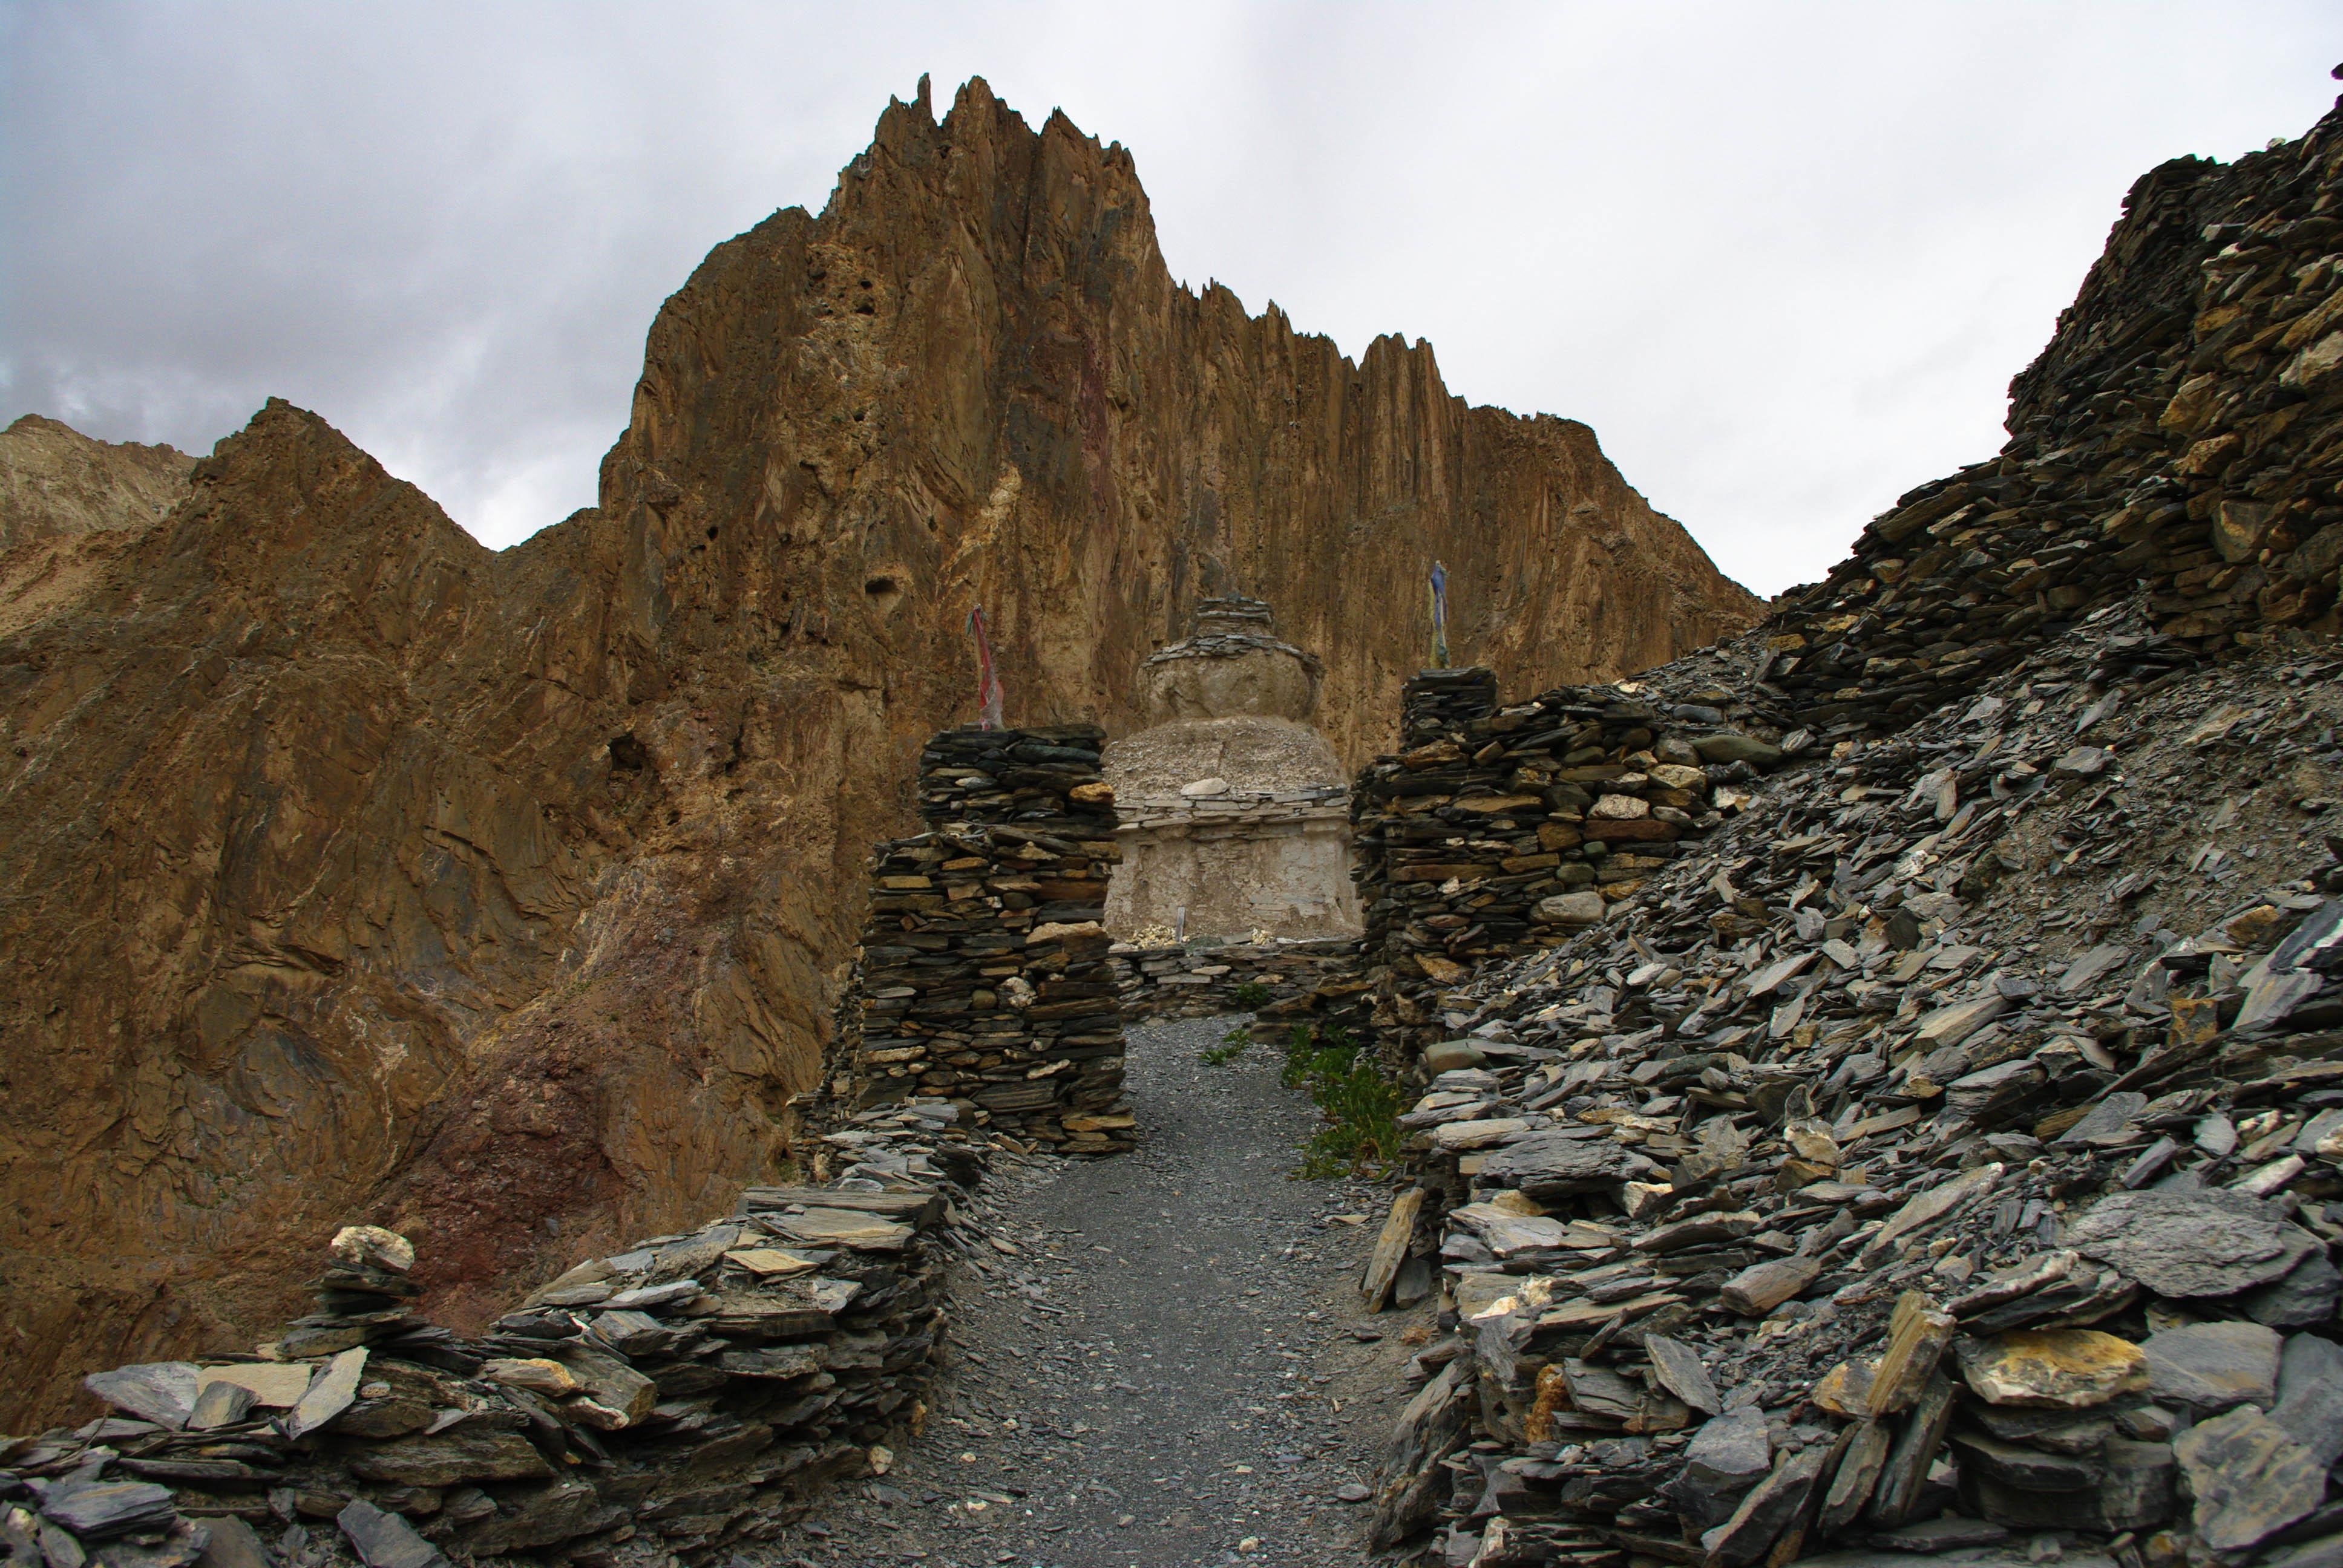 Тропа и ступа в горах Гималаи